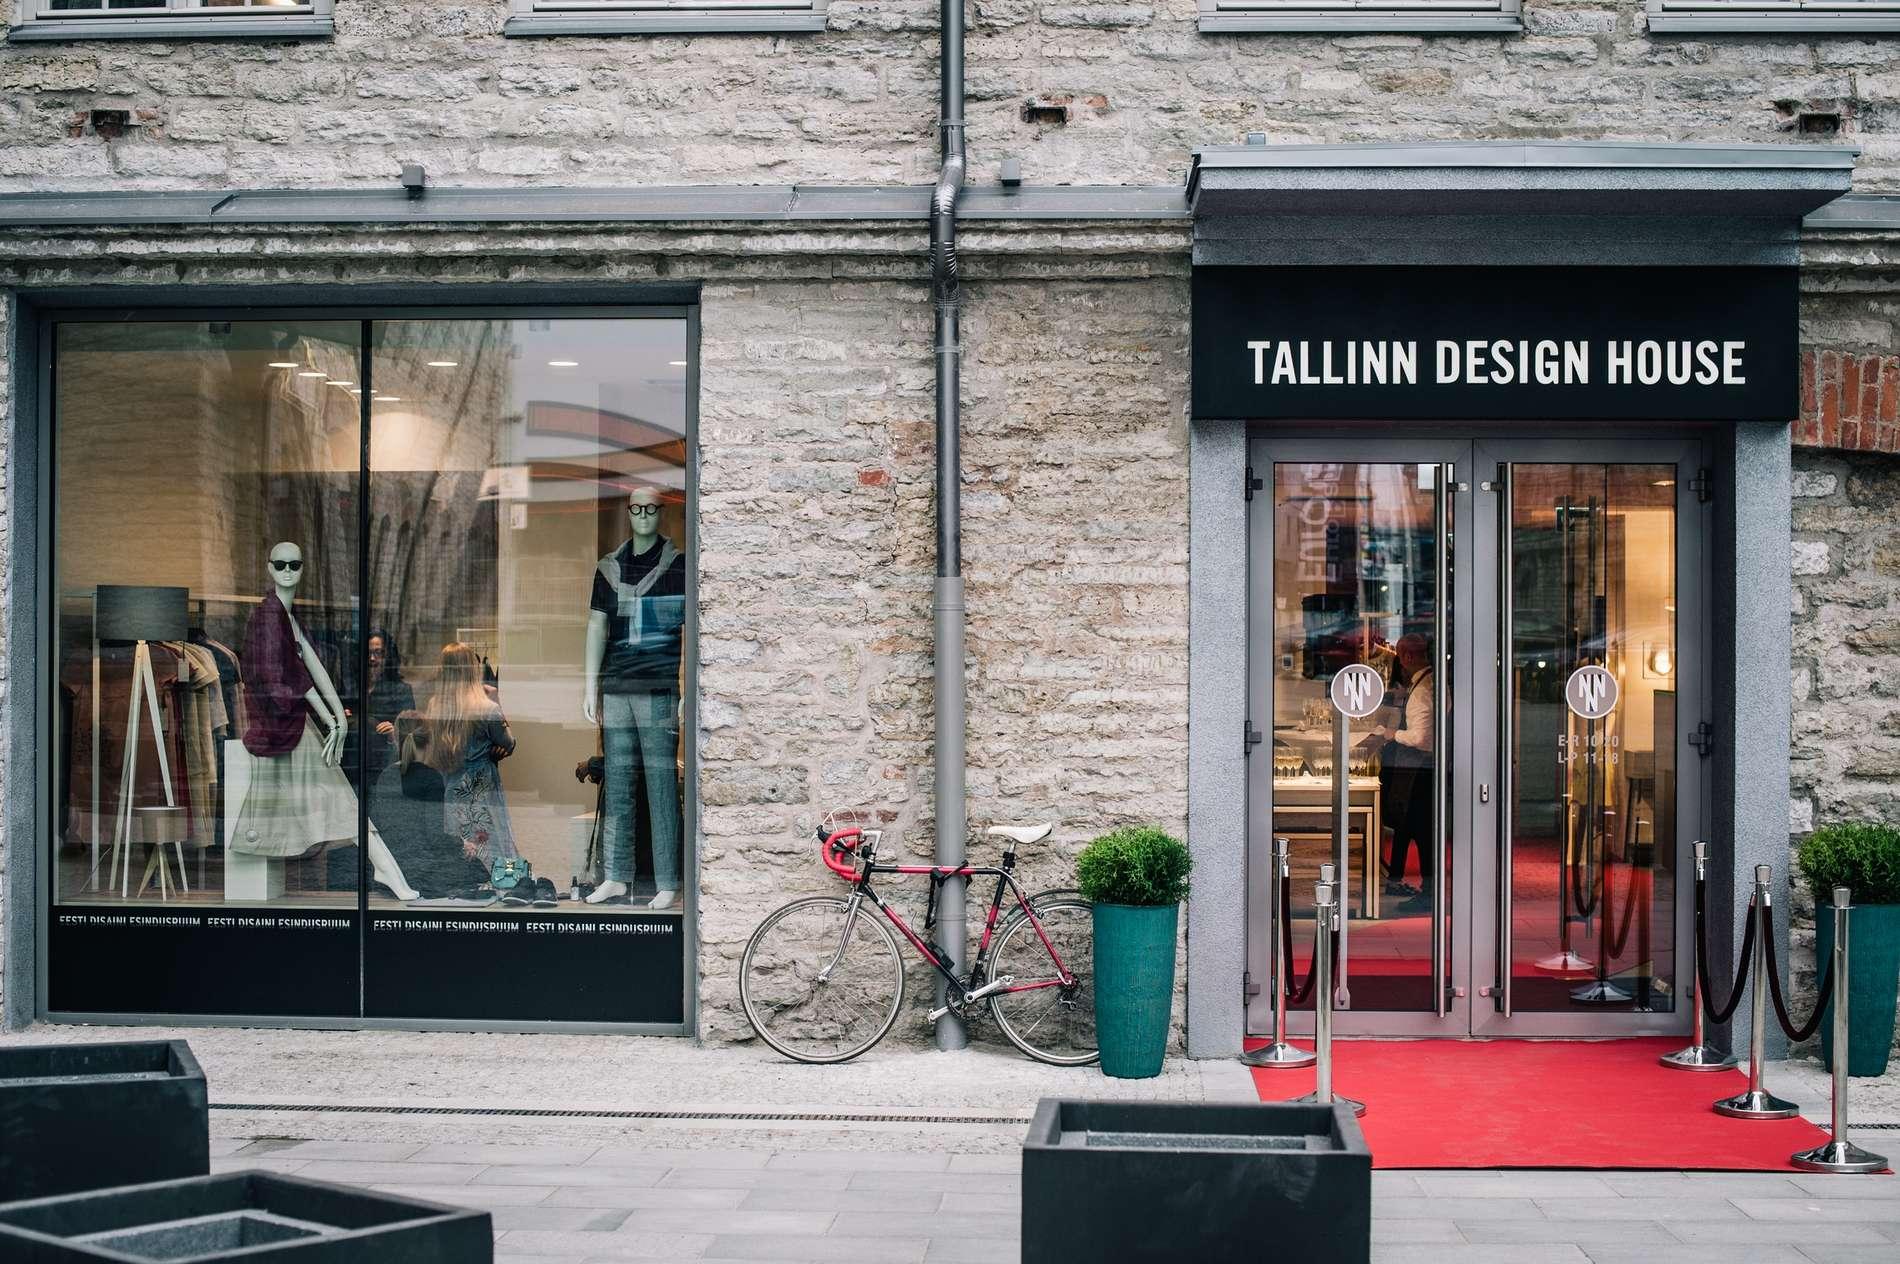 Tallinn Design House - välis